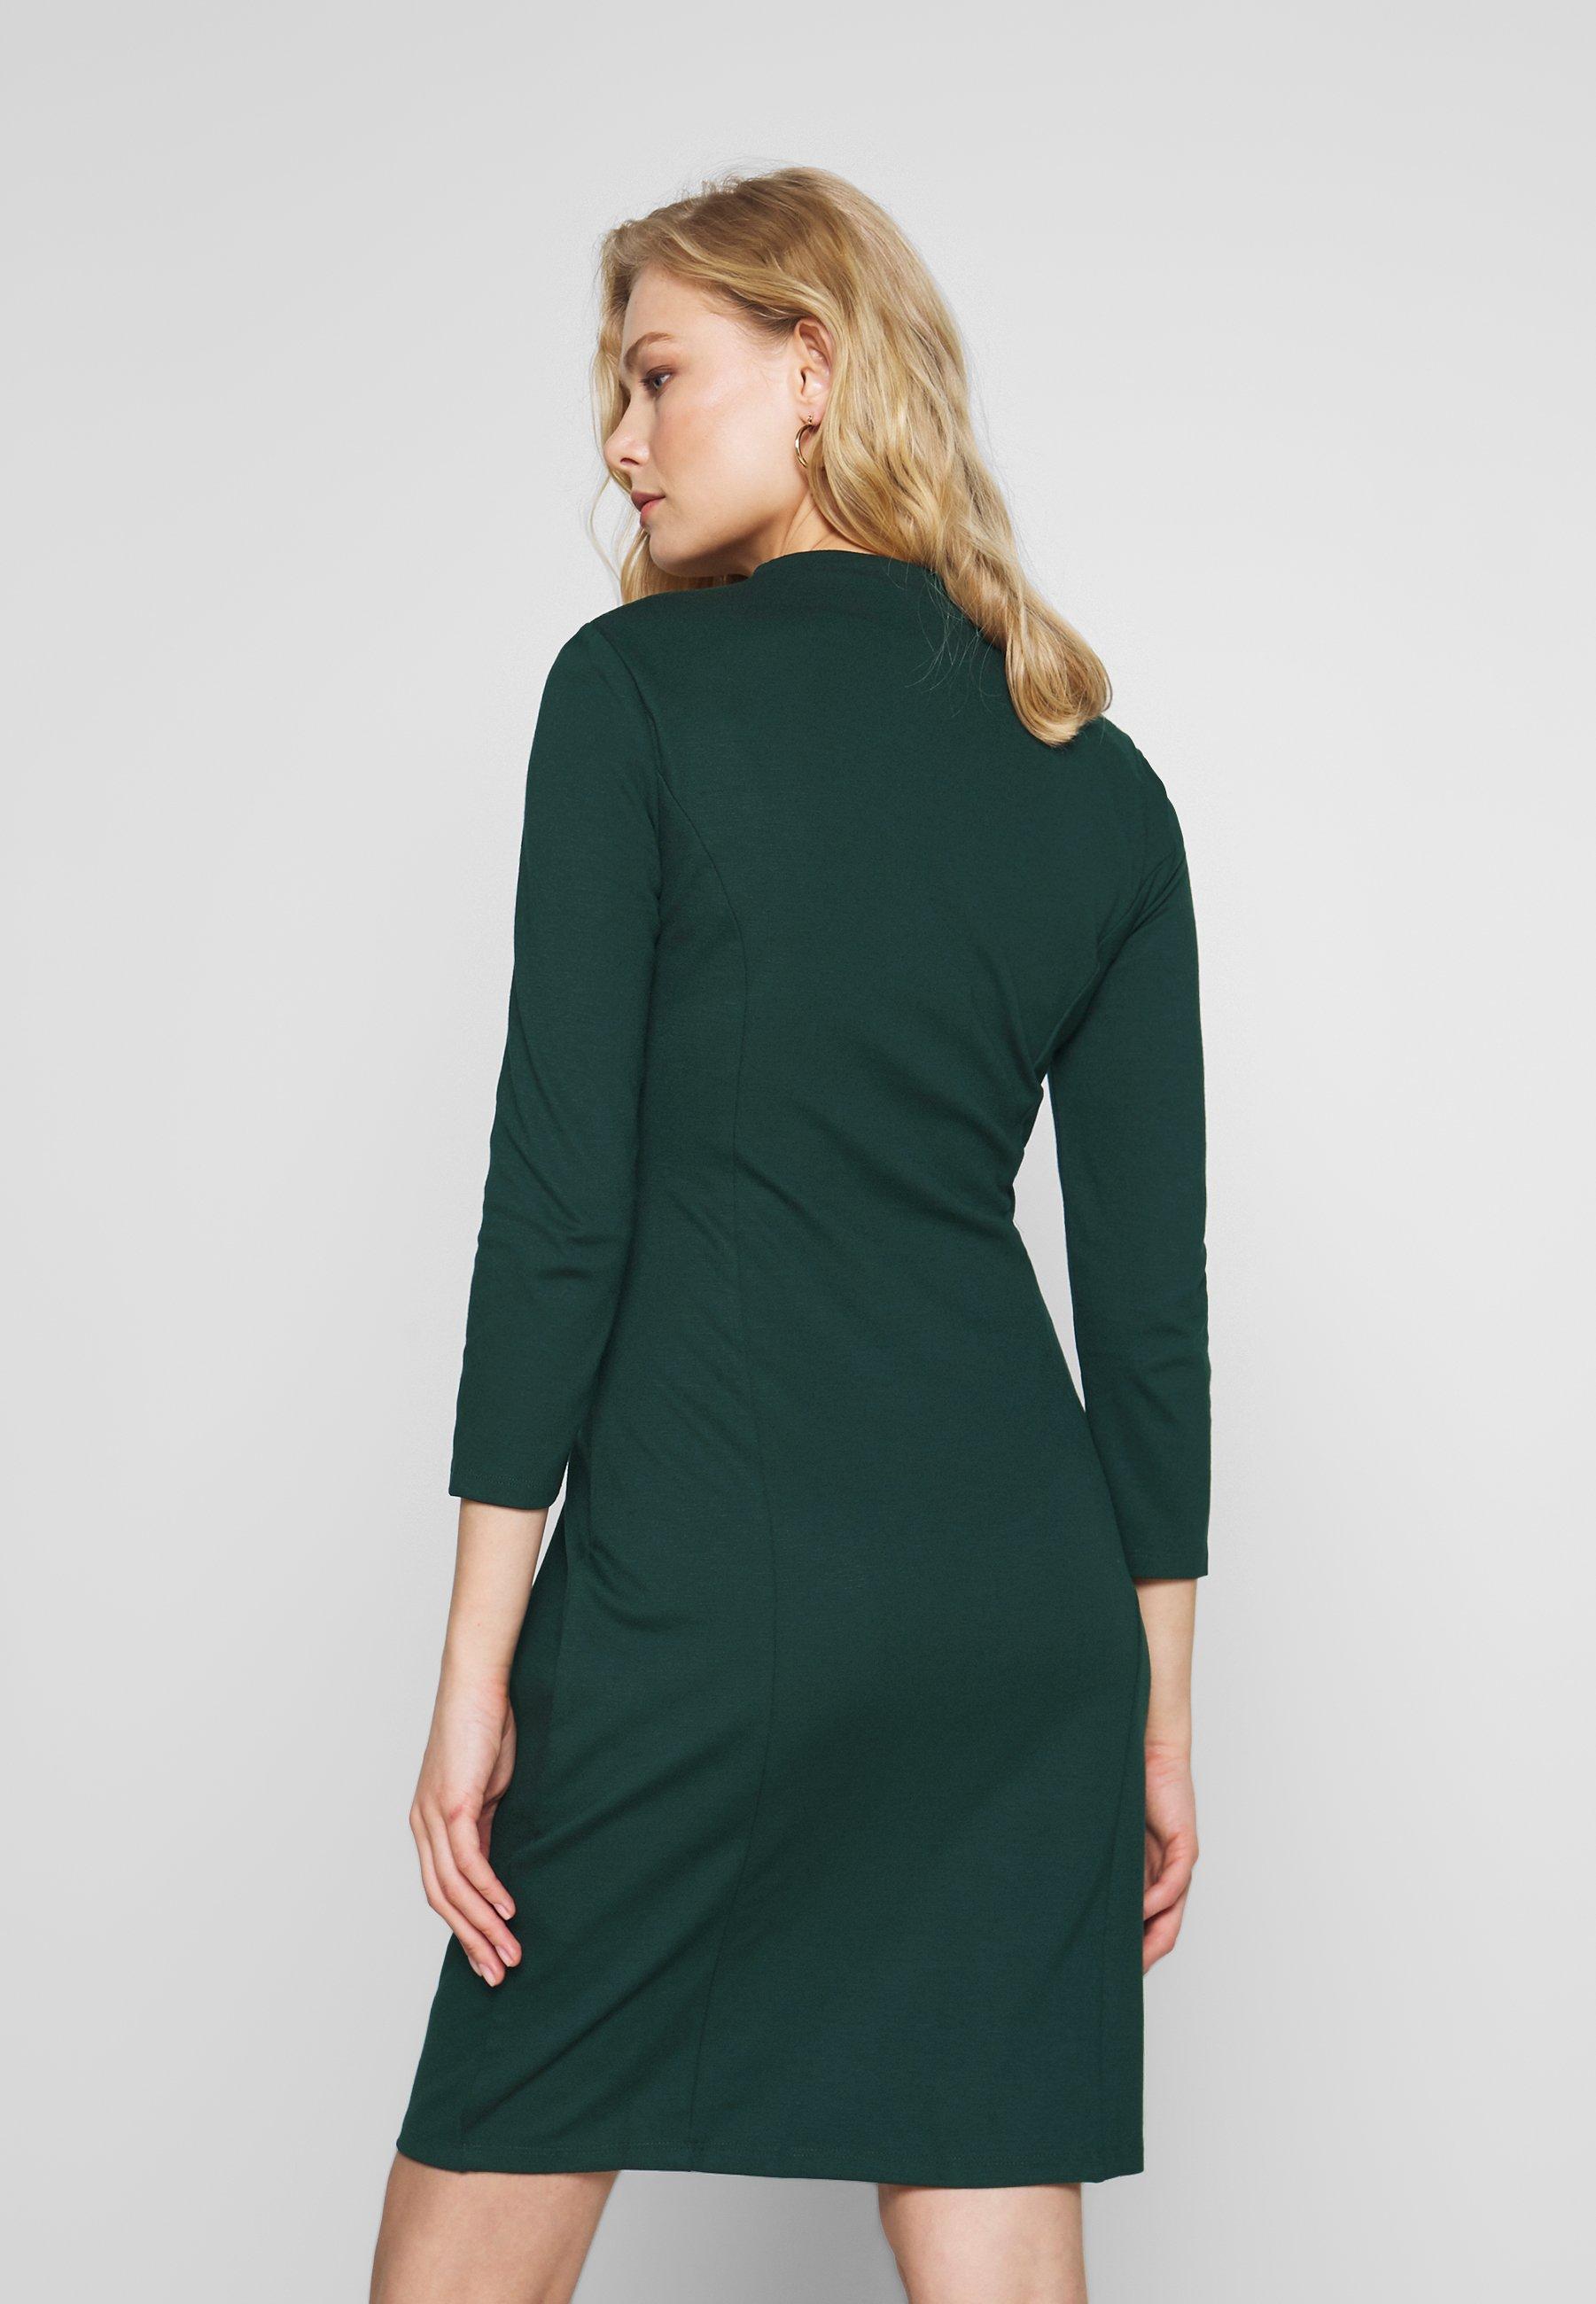 Anna Field Basic - Etuikjole Dark Green